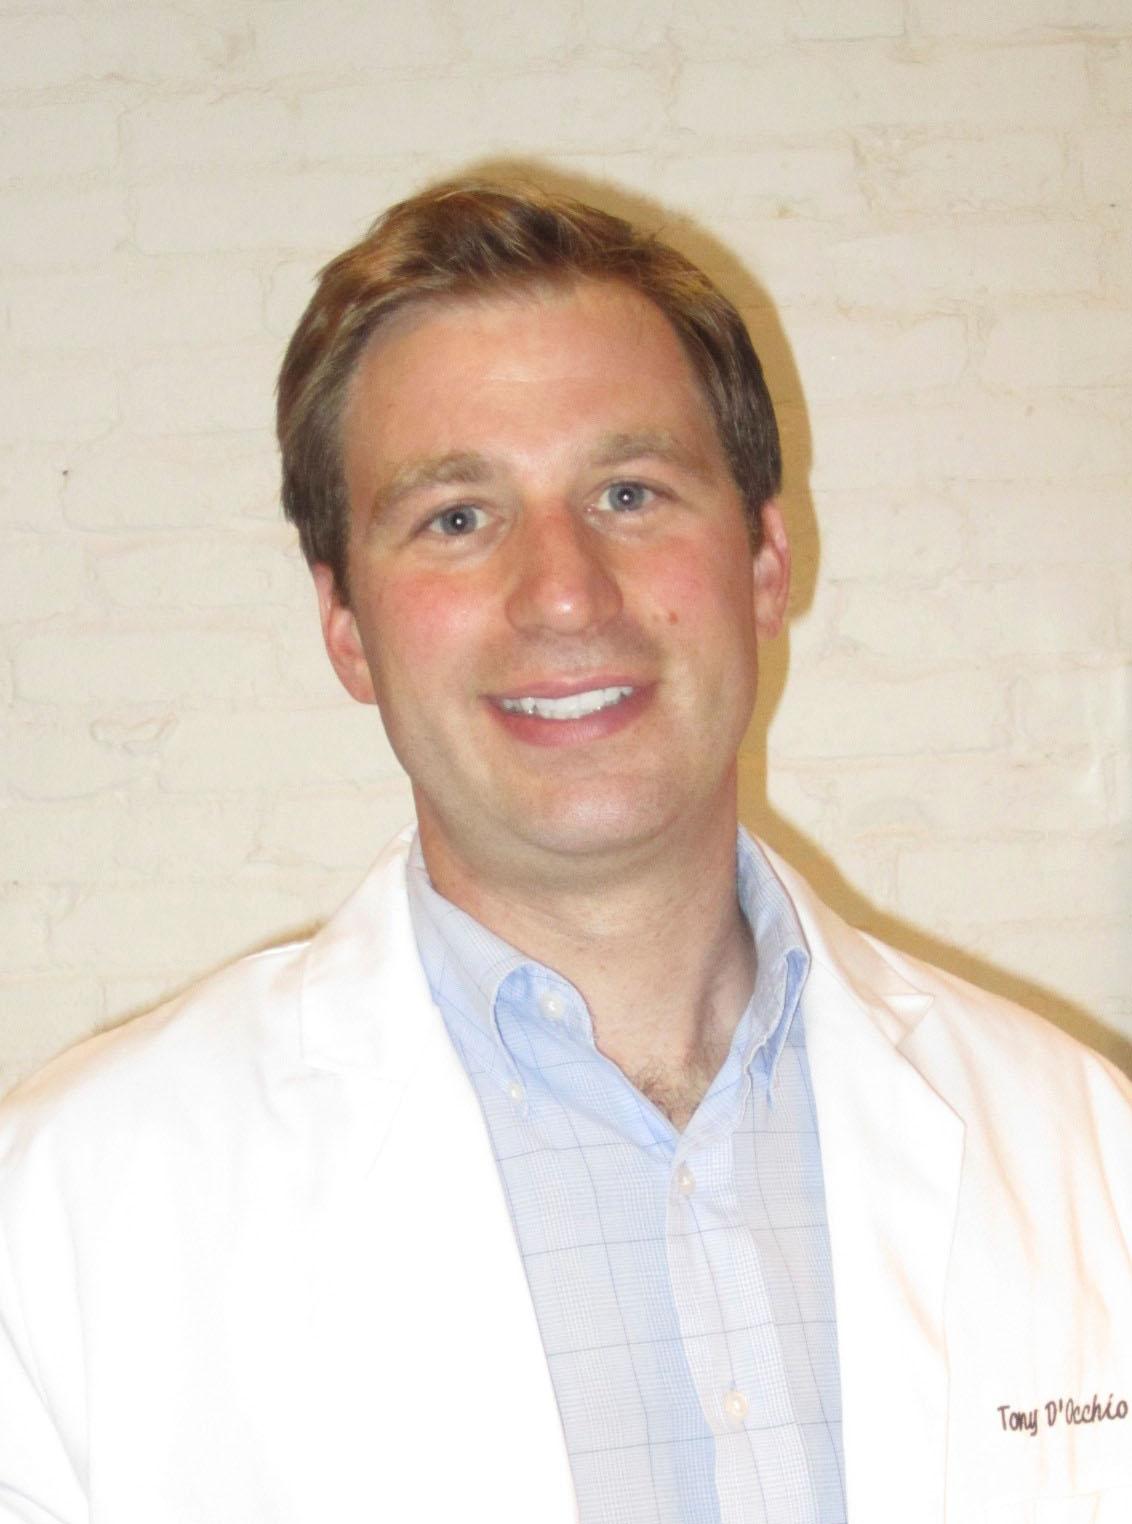 Dr. Tony D'Occhio, Dentist